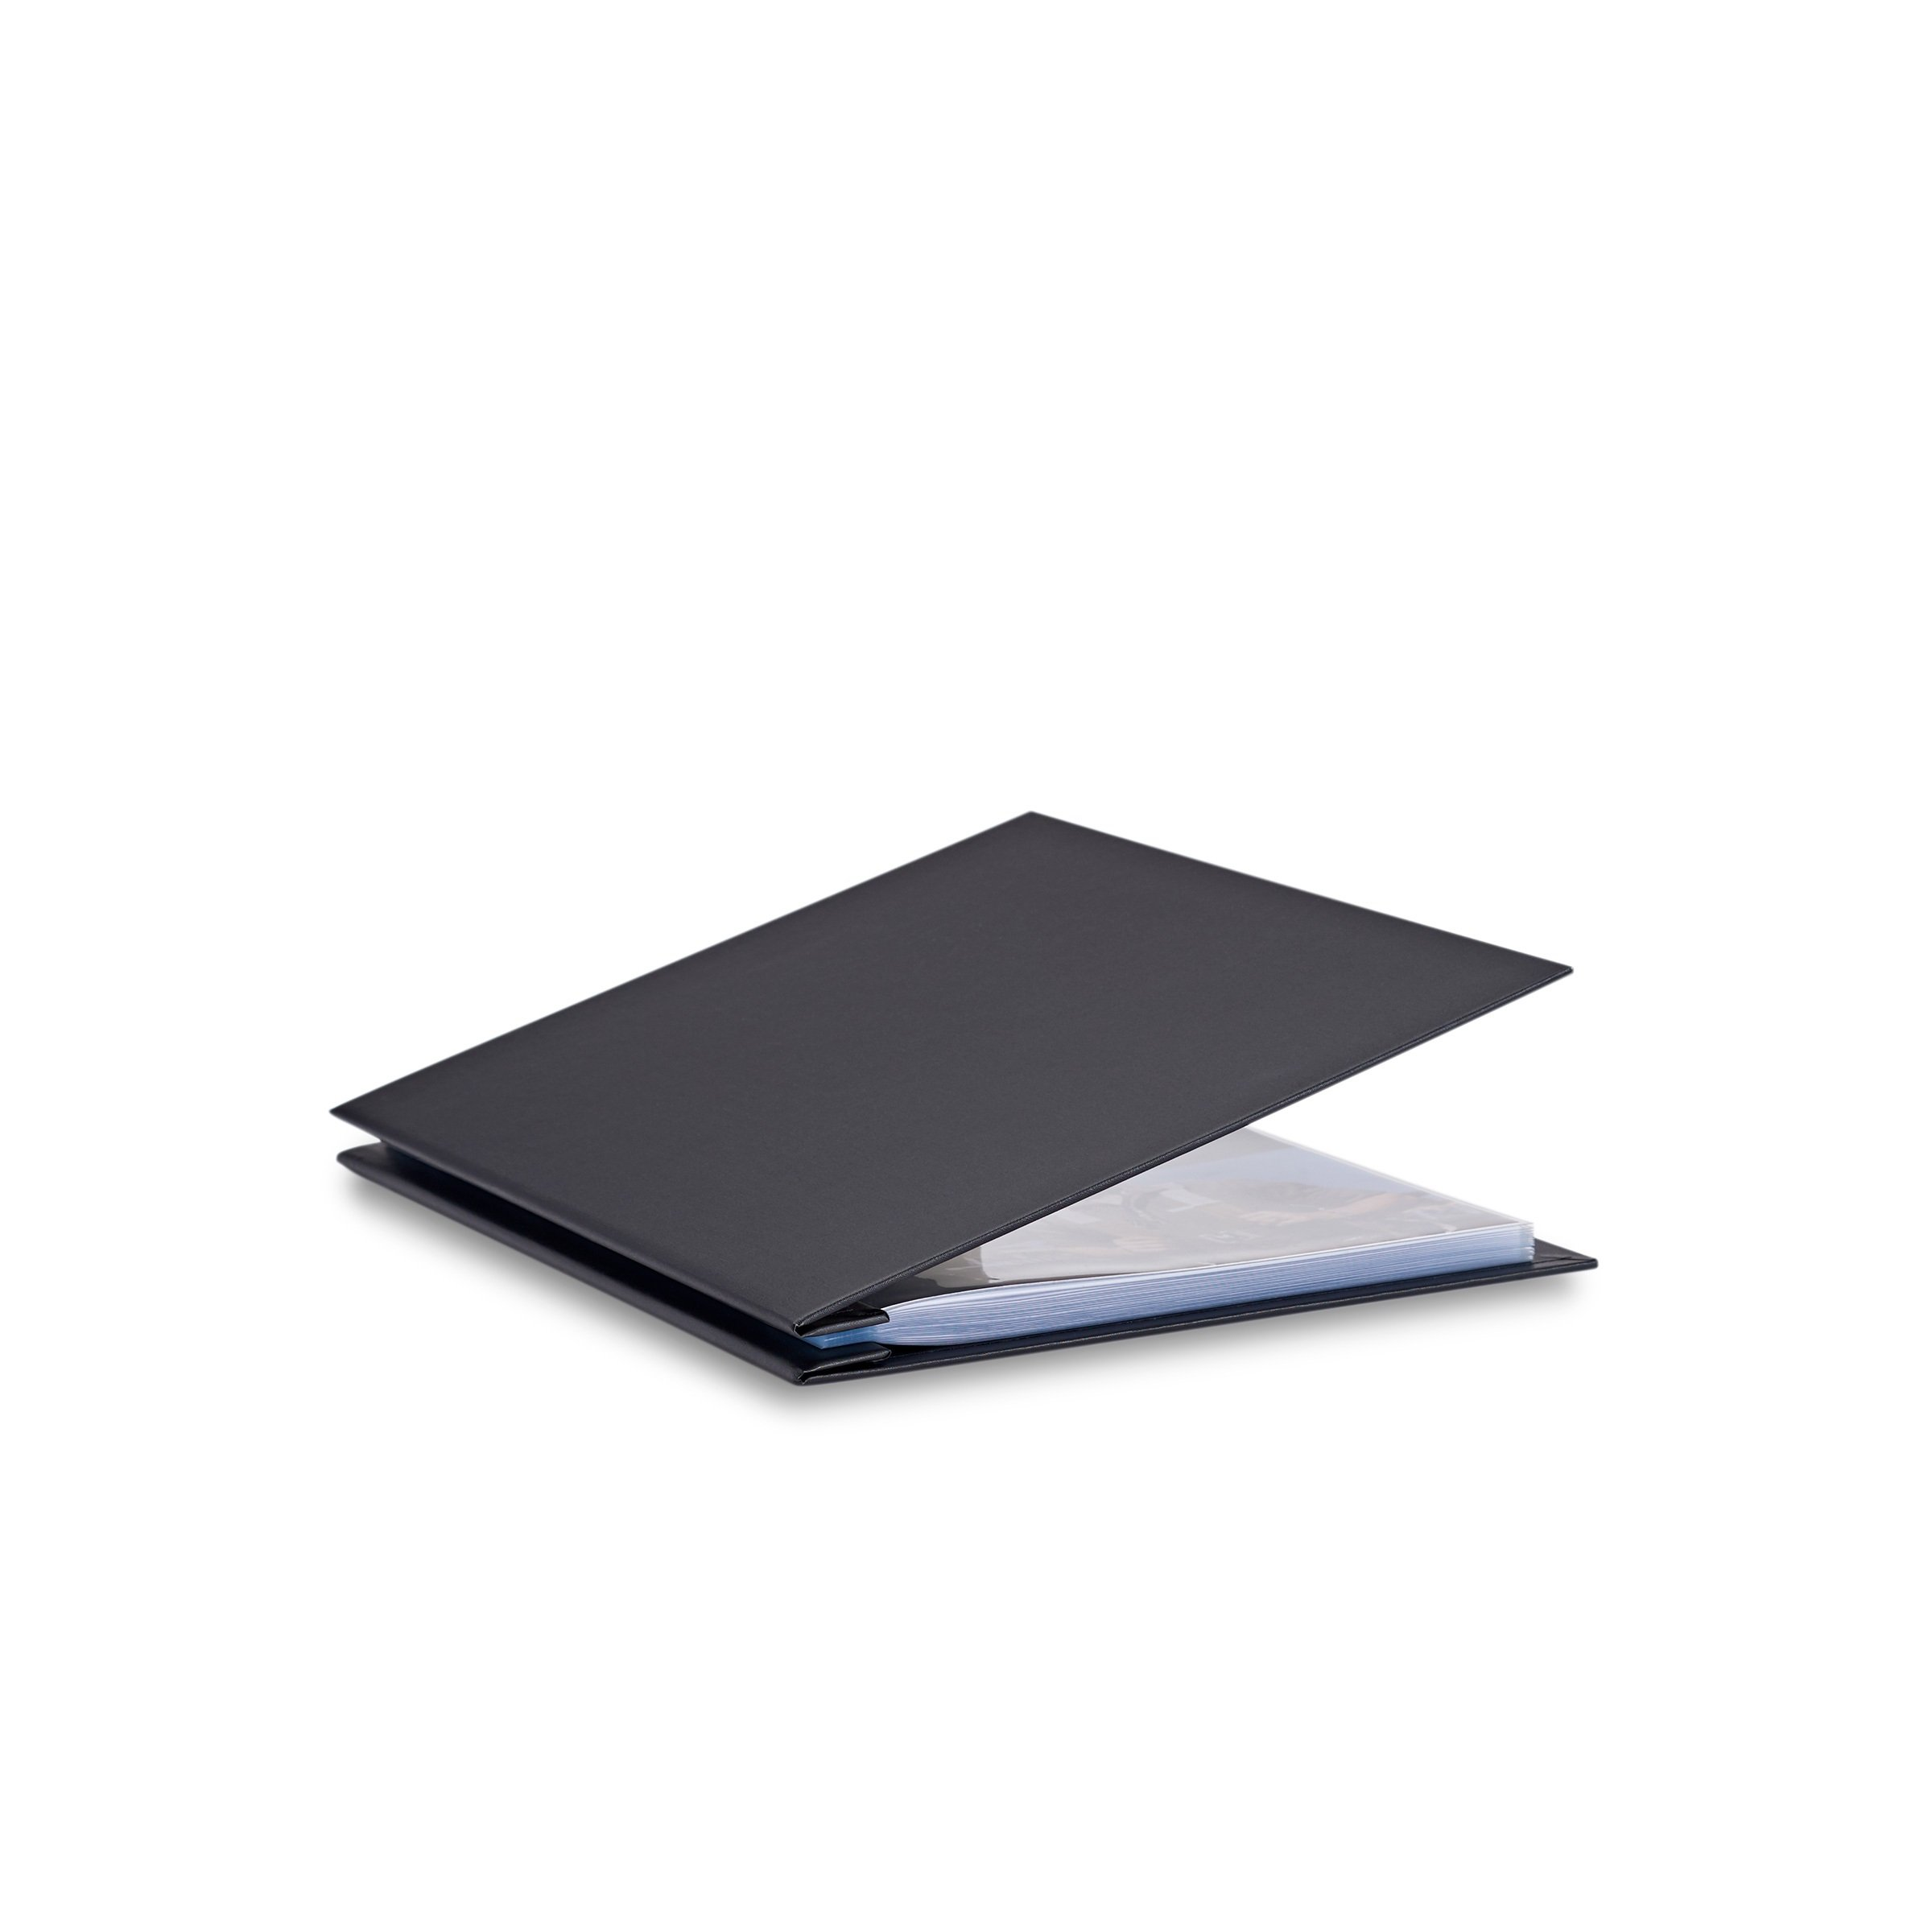 Pina Zangaro Bex 8.5x11 Portriat Screwpost Binder Black, Includes 20 Pro-Archive Sheet Protectors (34053)